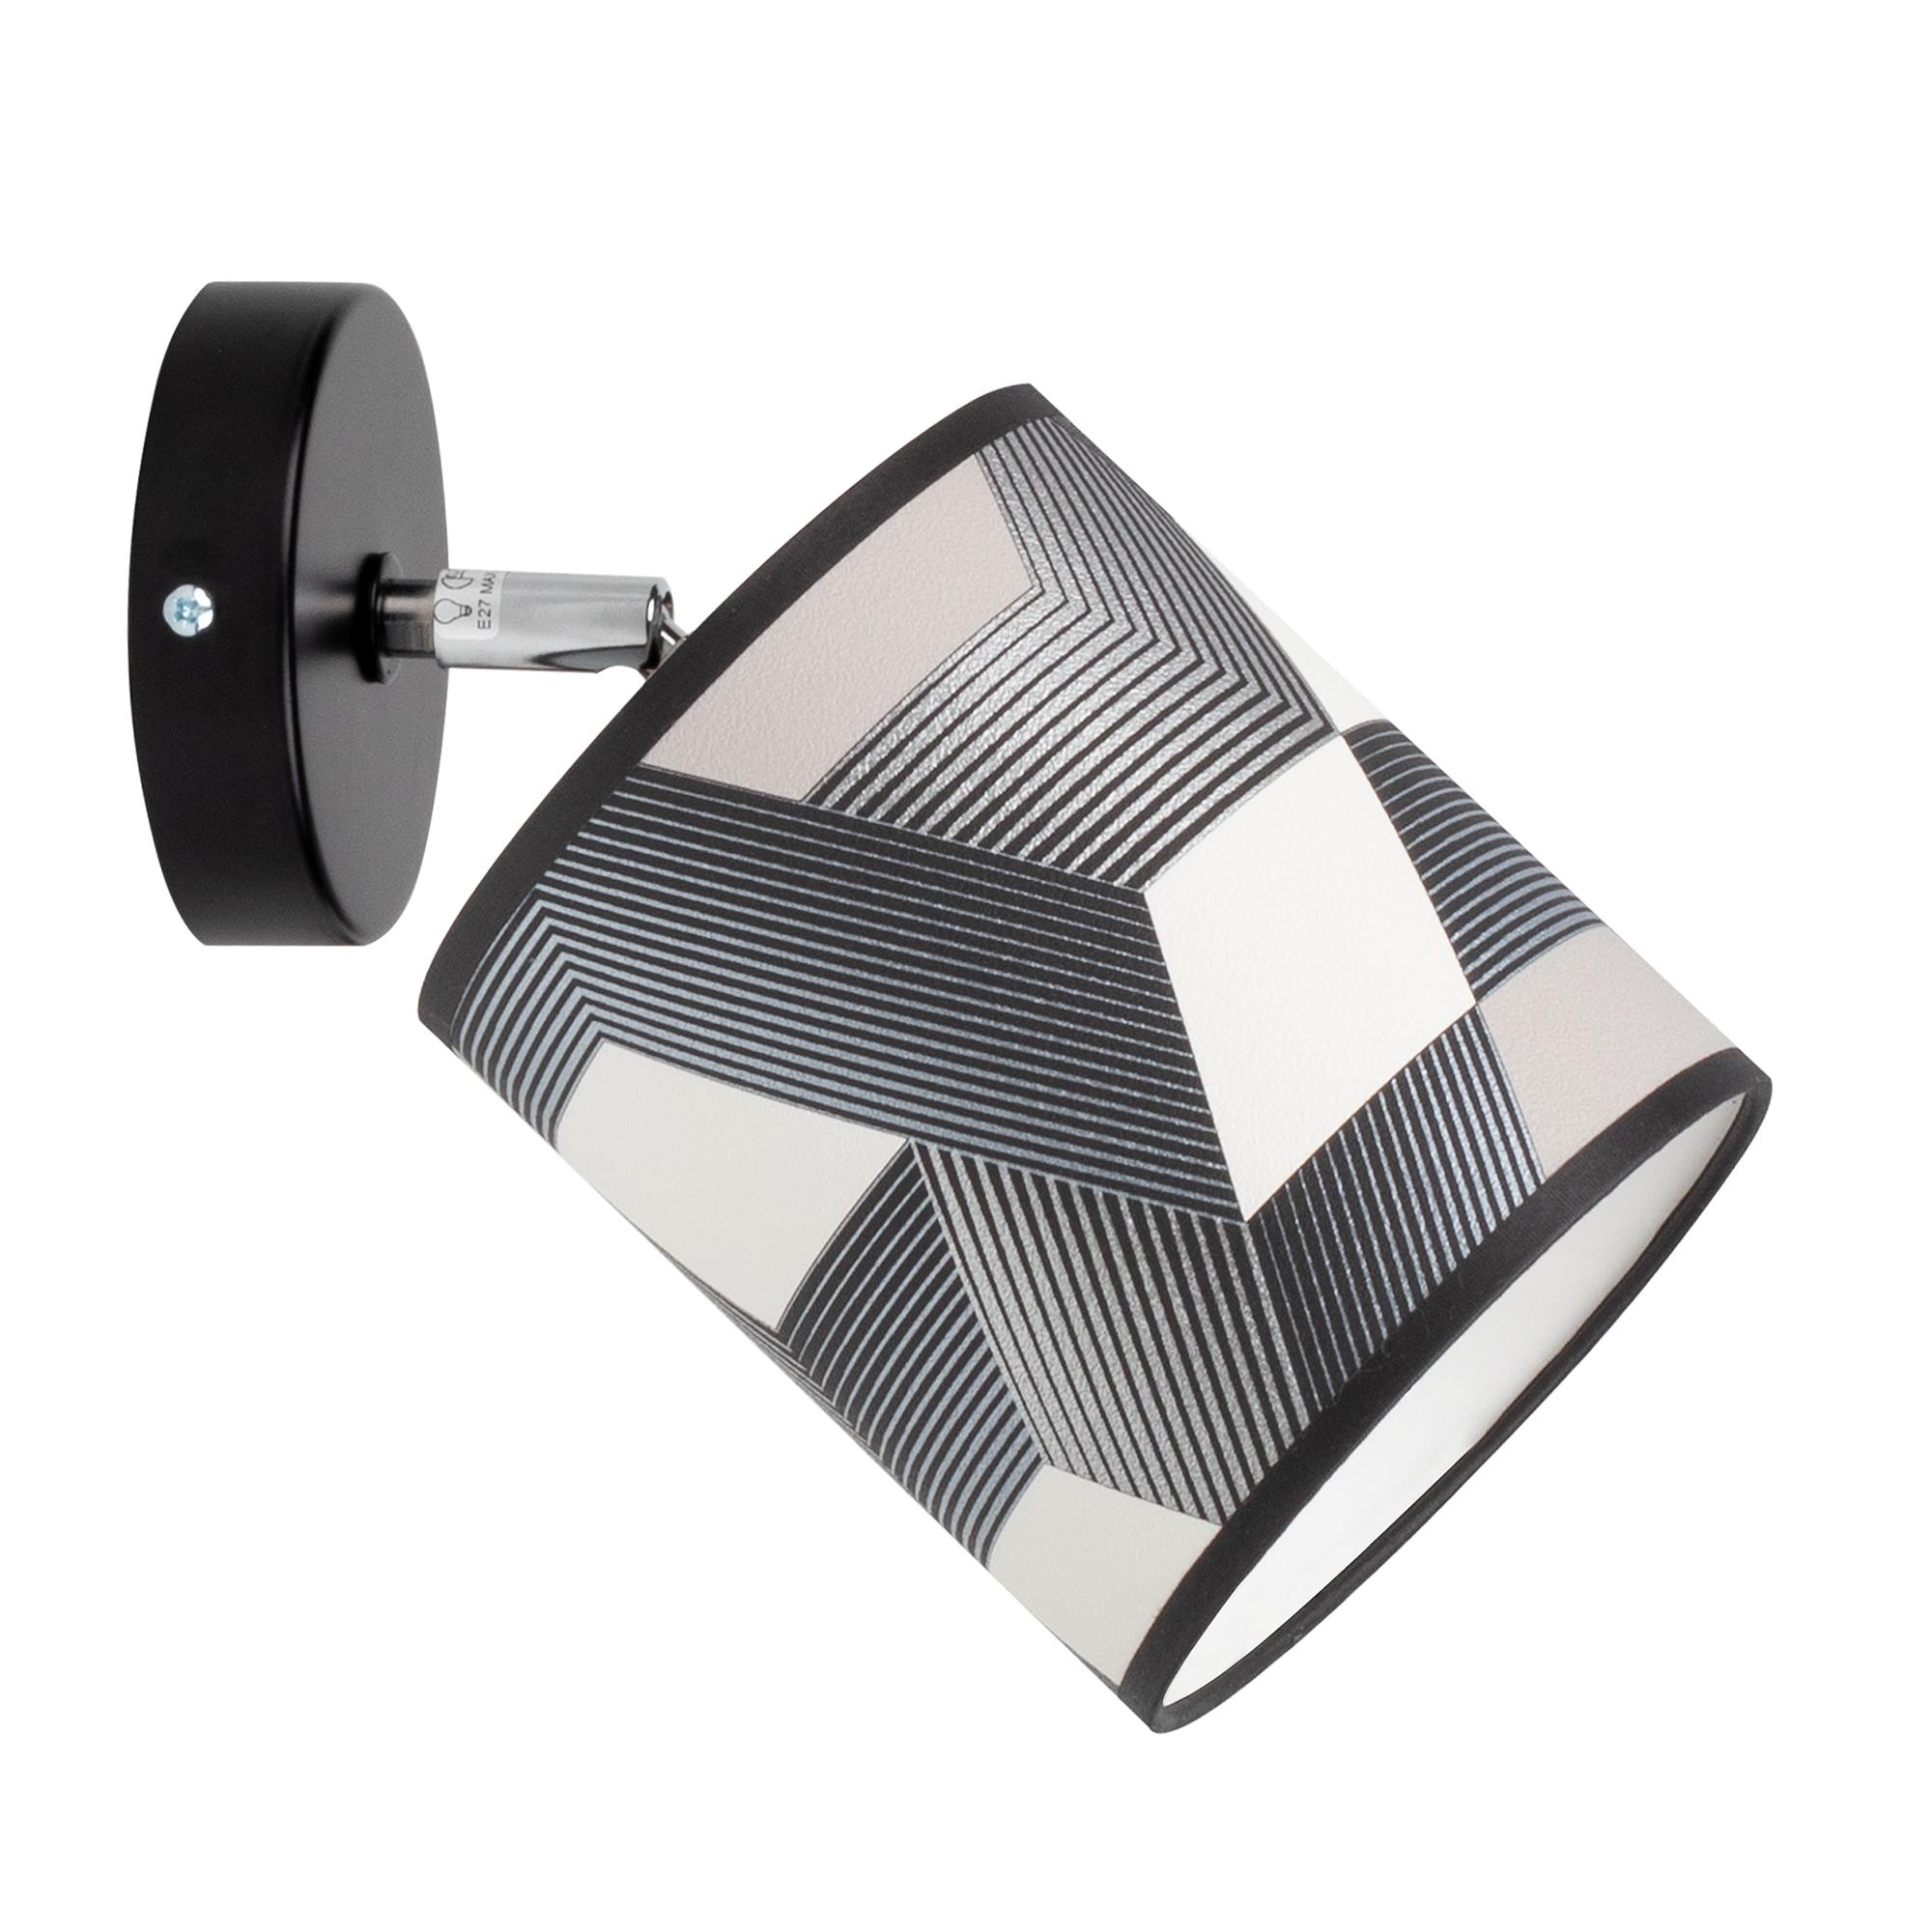 BRITOP LIGHTING Wandleuchte ESPACIO, E27, Schirme aus laminierter Tapete, bewegliche Spots, passende LM E27 / exklusive, Made in Europe